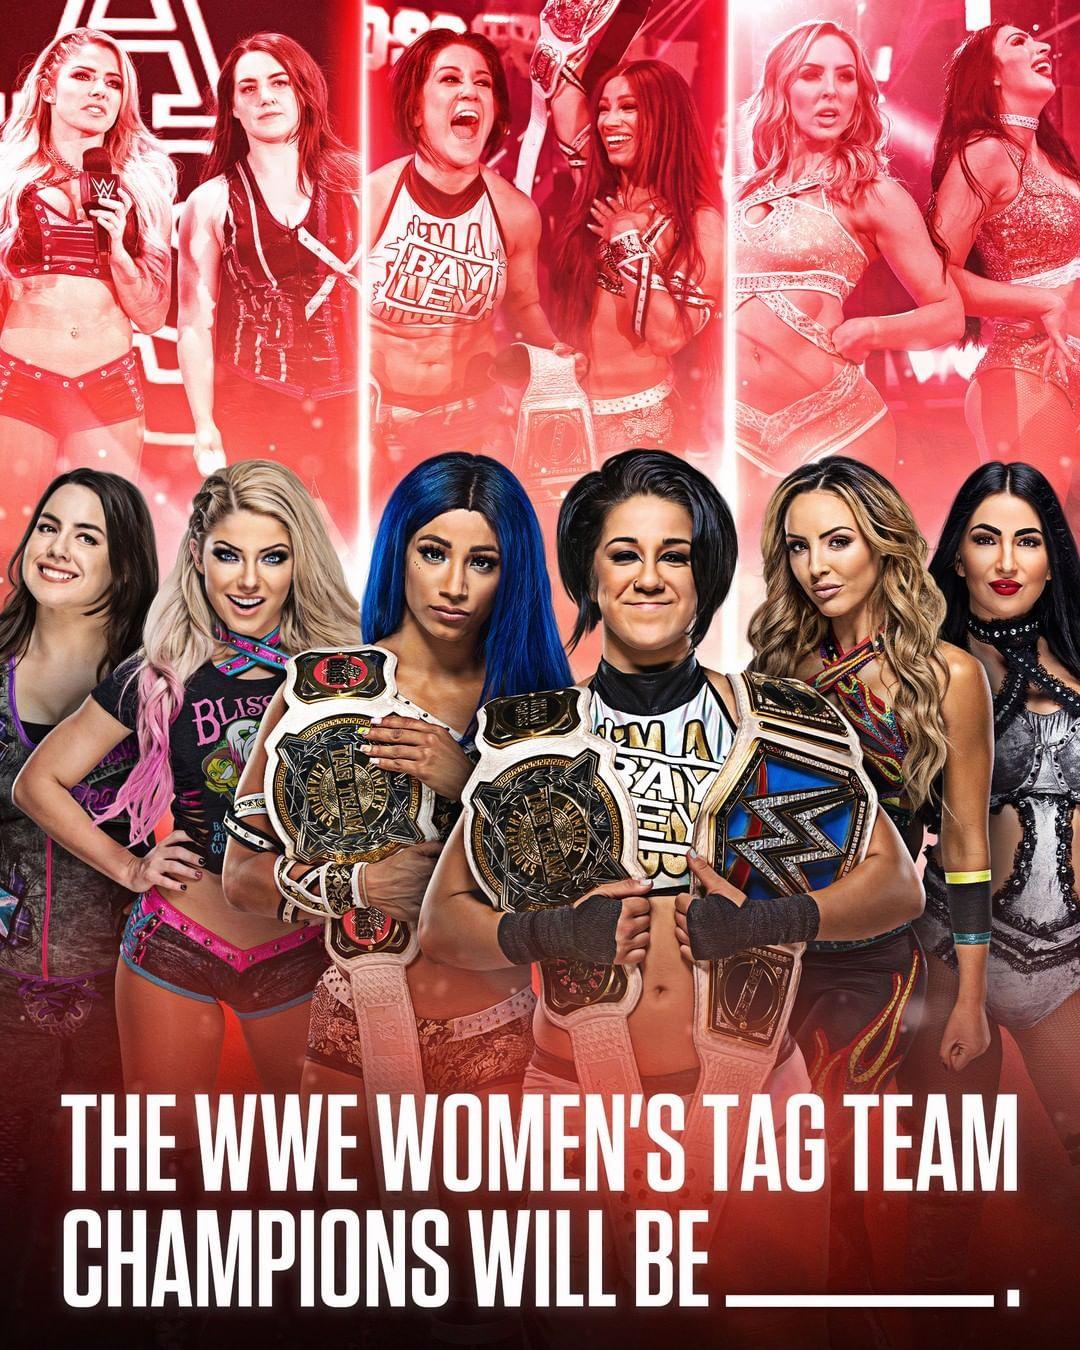 "WWE on Instagram: ""Who's leaving #WWEBacklash as WWE Women's #TagTeamChampions? Tag the winners 👇"""